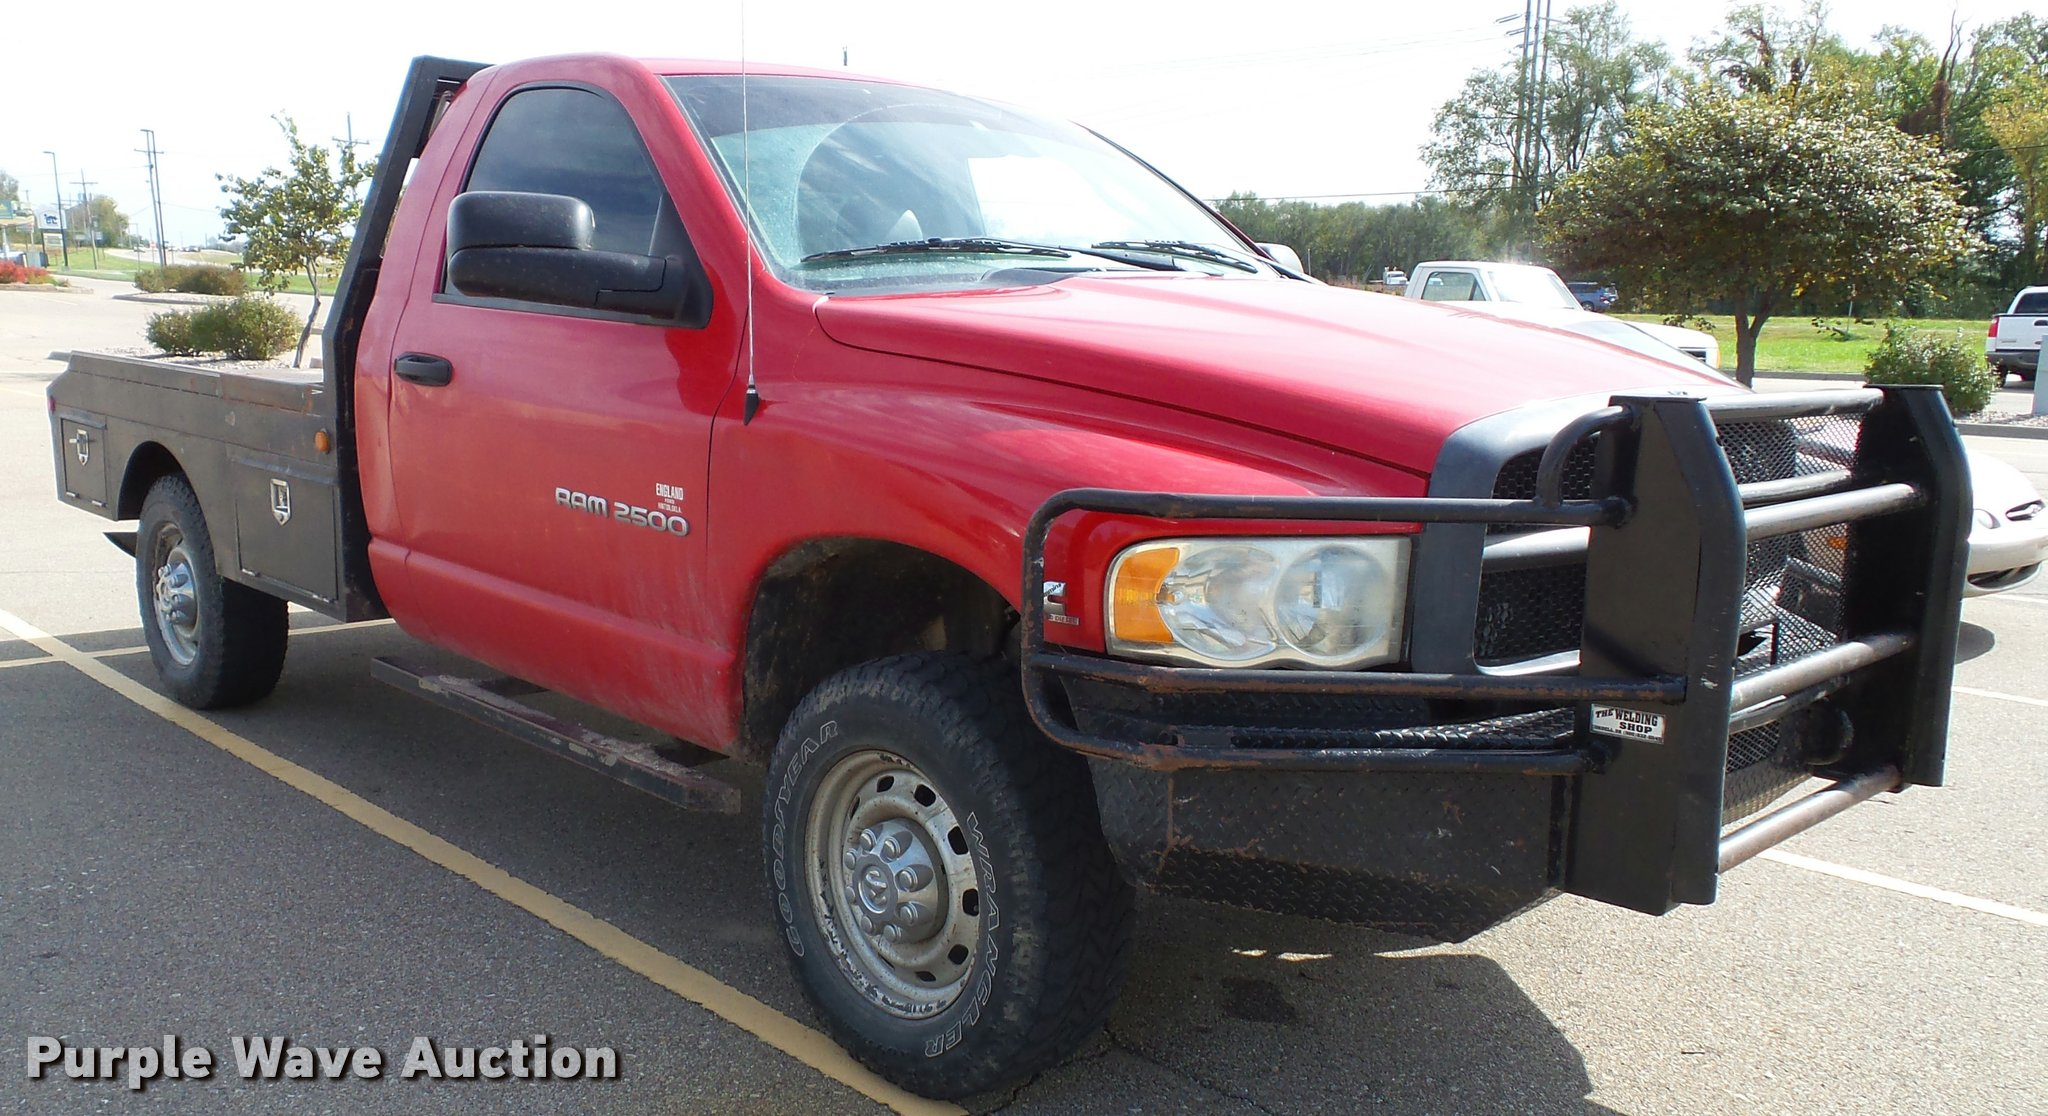 2003 Dodge Ram 2500 Flatbed Pickup Truck Item K8164 Sold Full Size In New Window